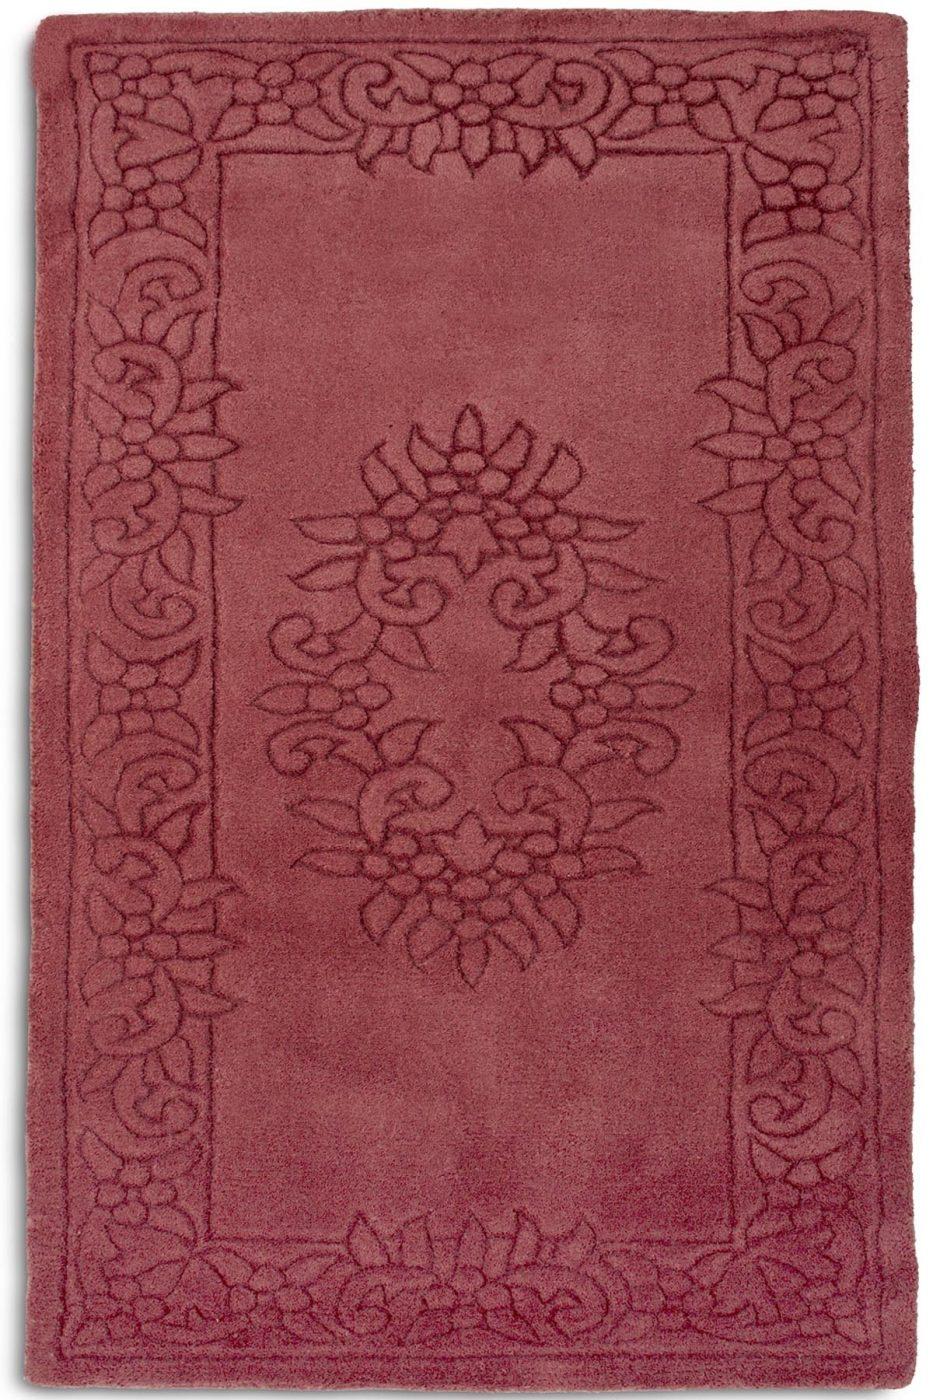 Royale ROY07 | Plantation Rug Company | Best at Flooring